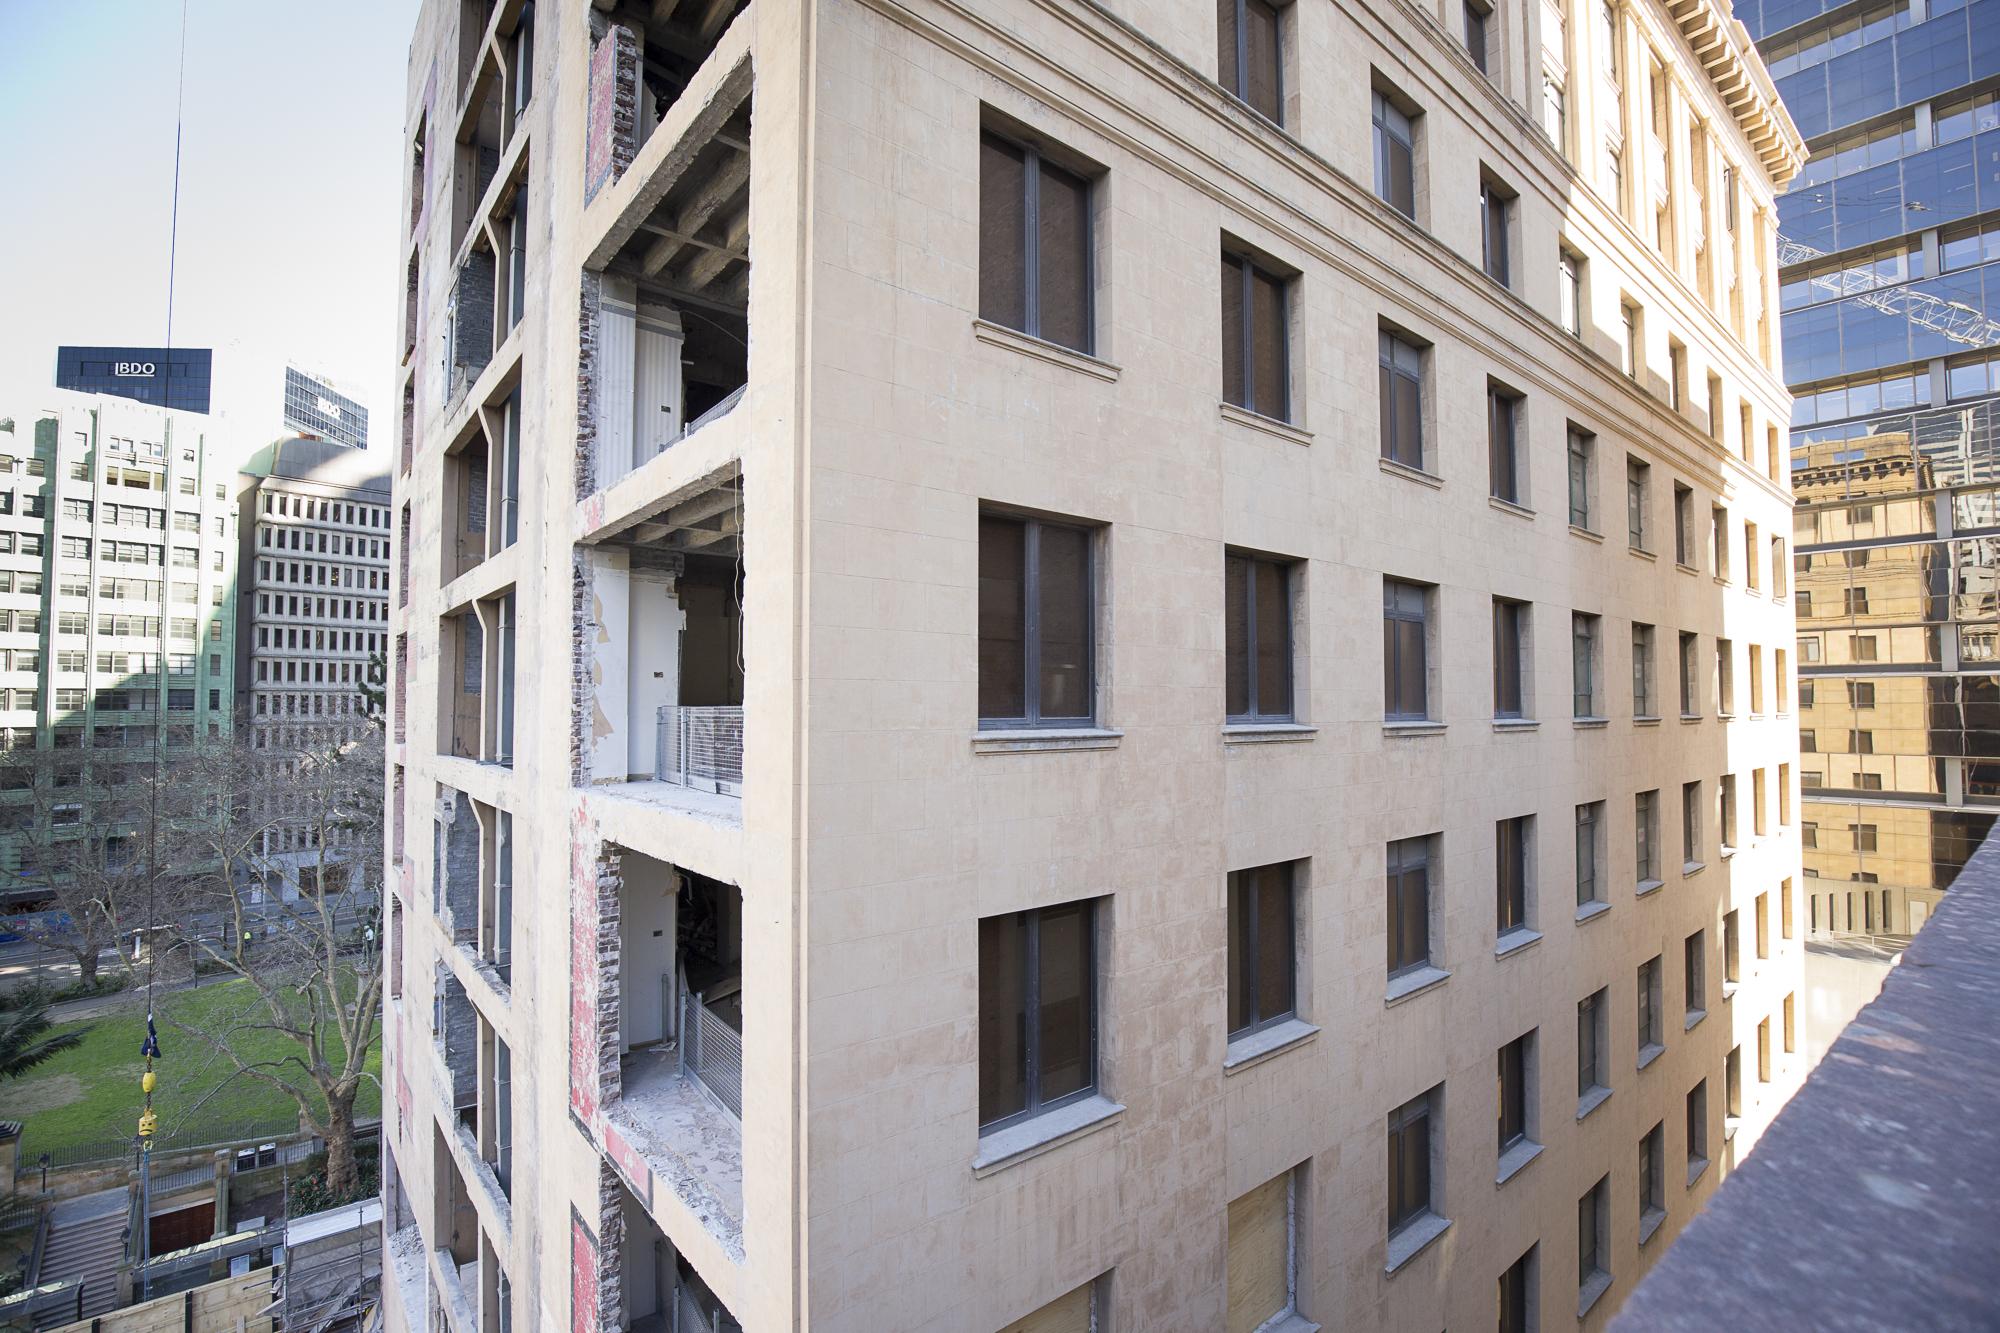 13 Tower - Shell House Internal brickwork removed